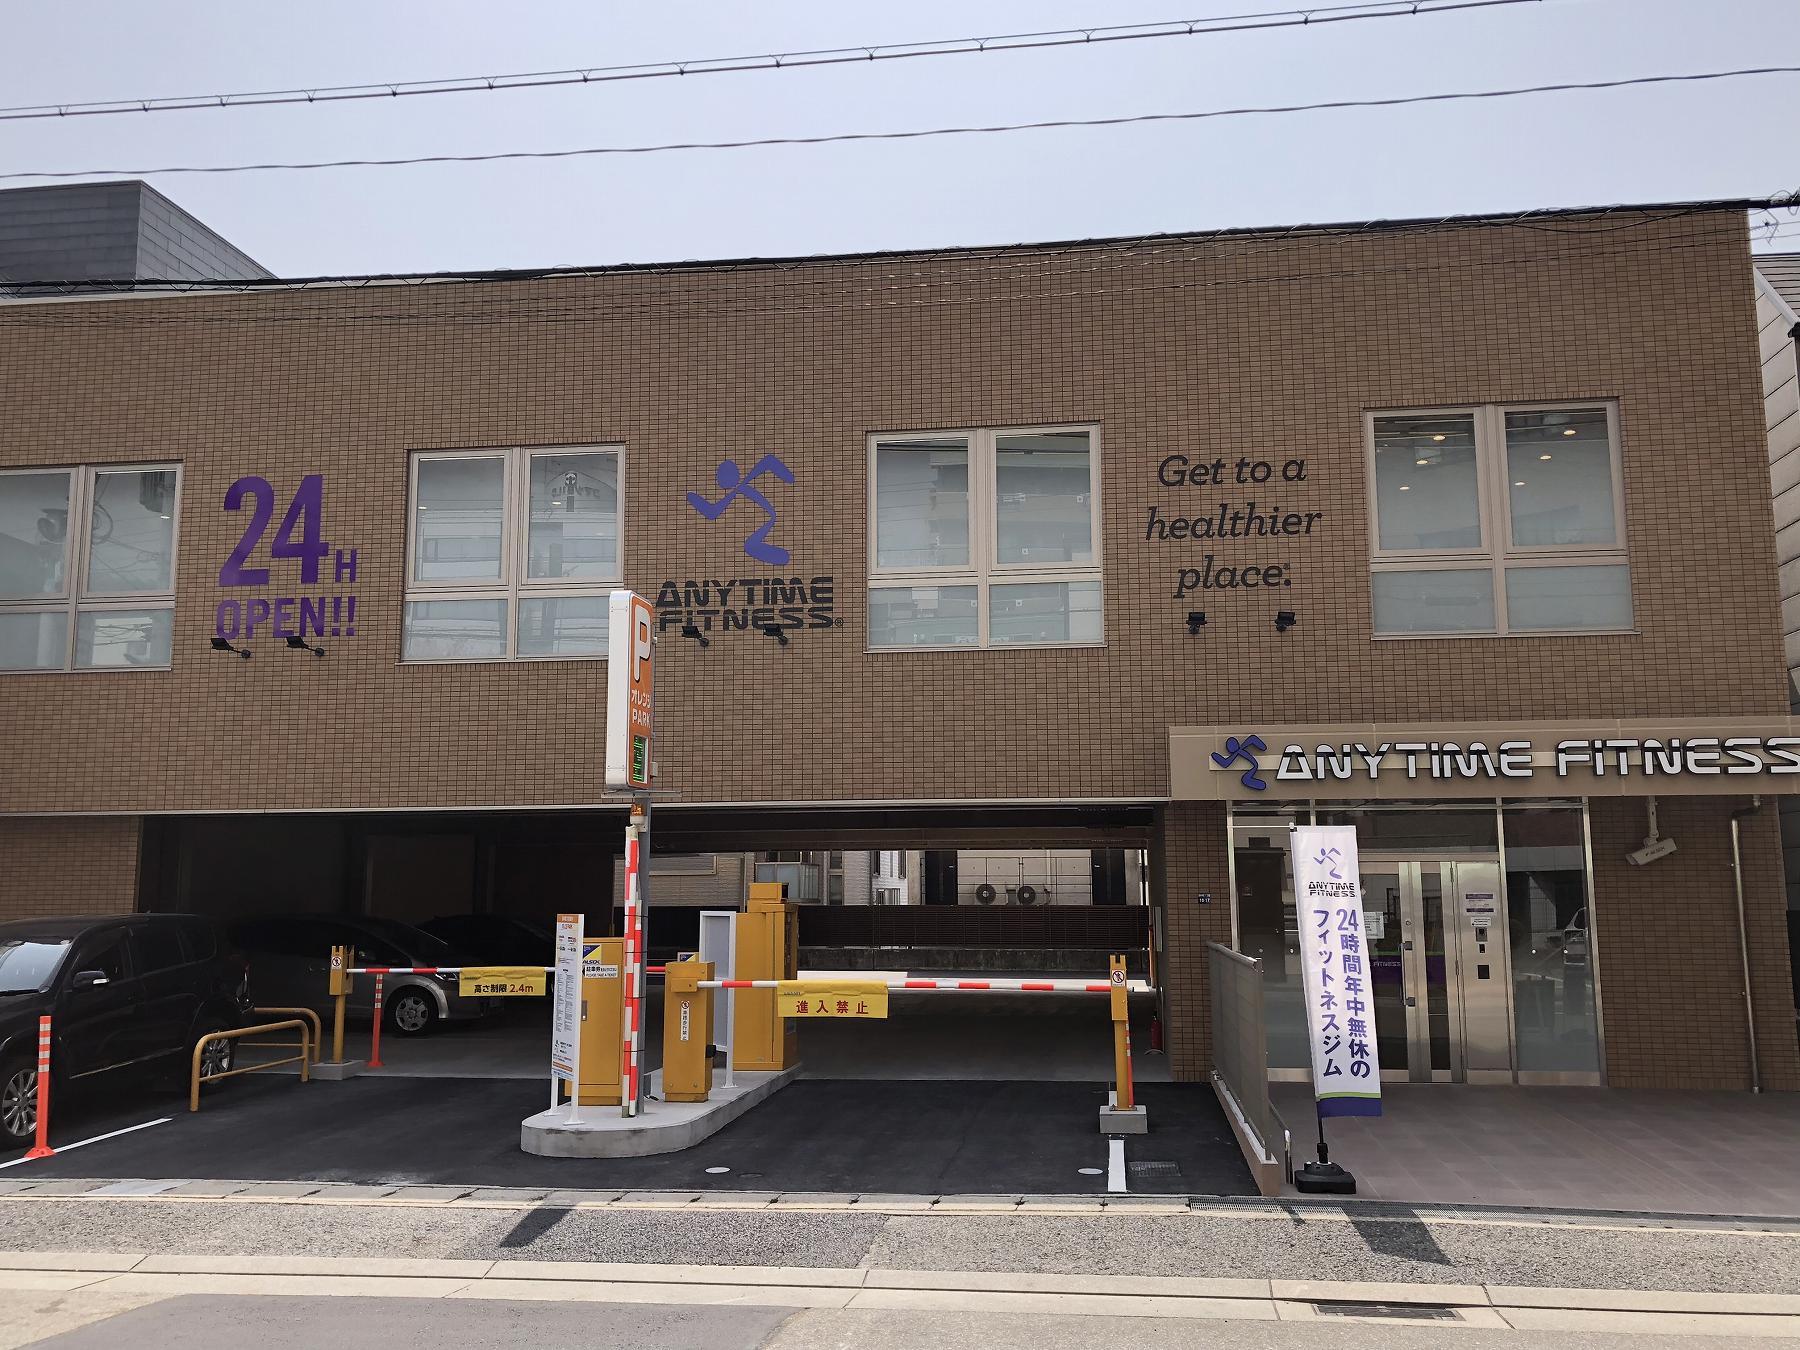 JR摂津本山駅南すぐ「 #エニタイムフィットネス摂津本山店 」が4/9(月)グランドオープンするよ! #新規オープン #エニタイムフィットネス #摂津本山